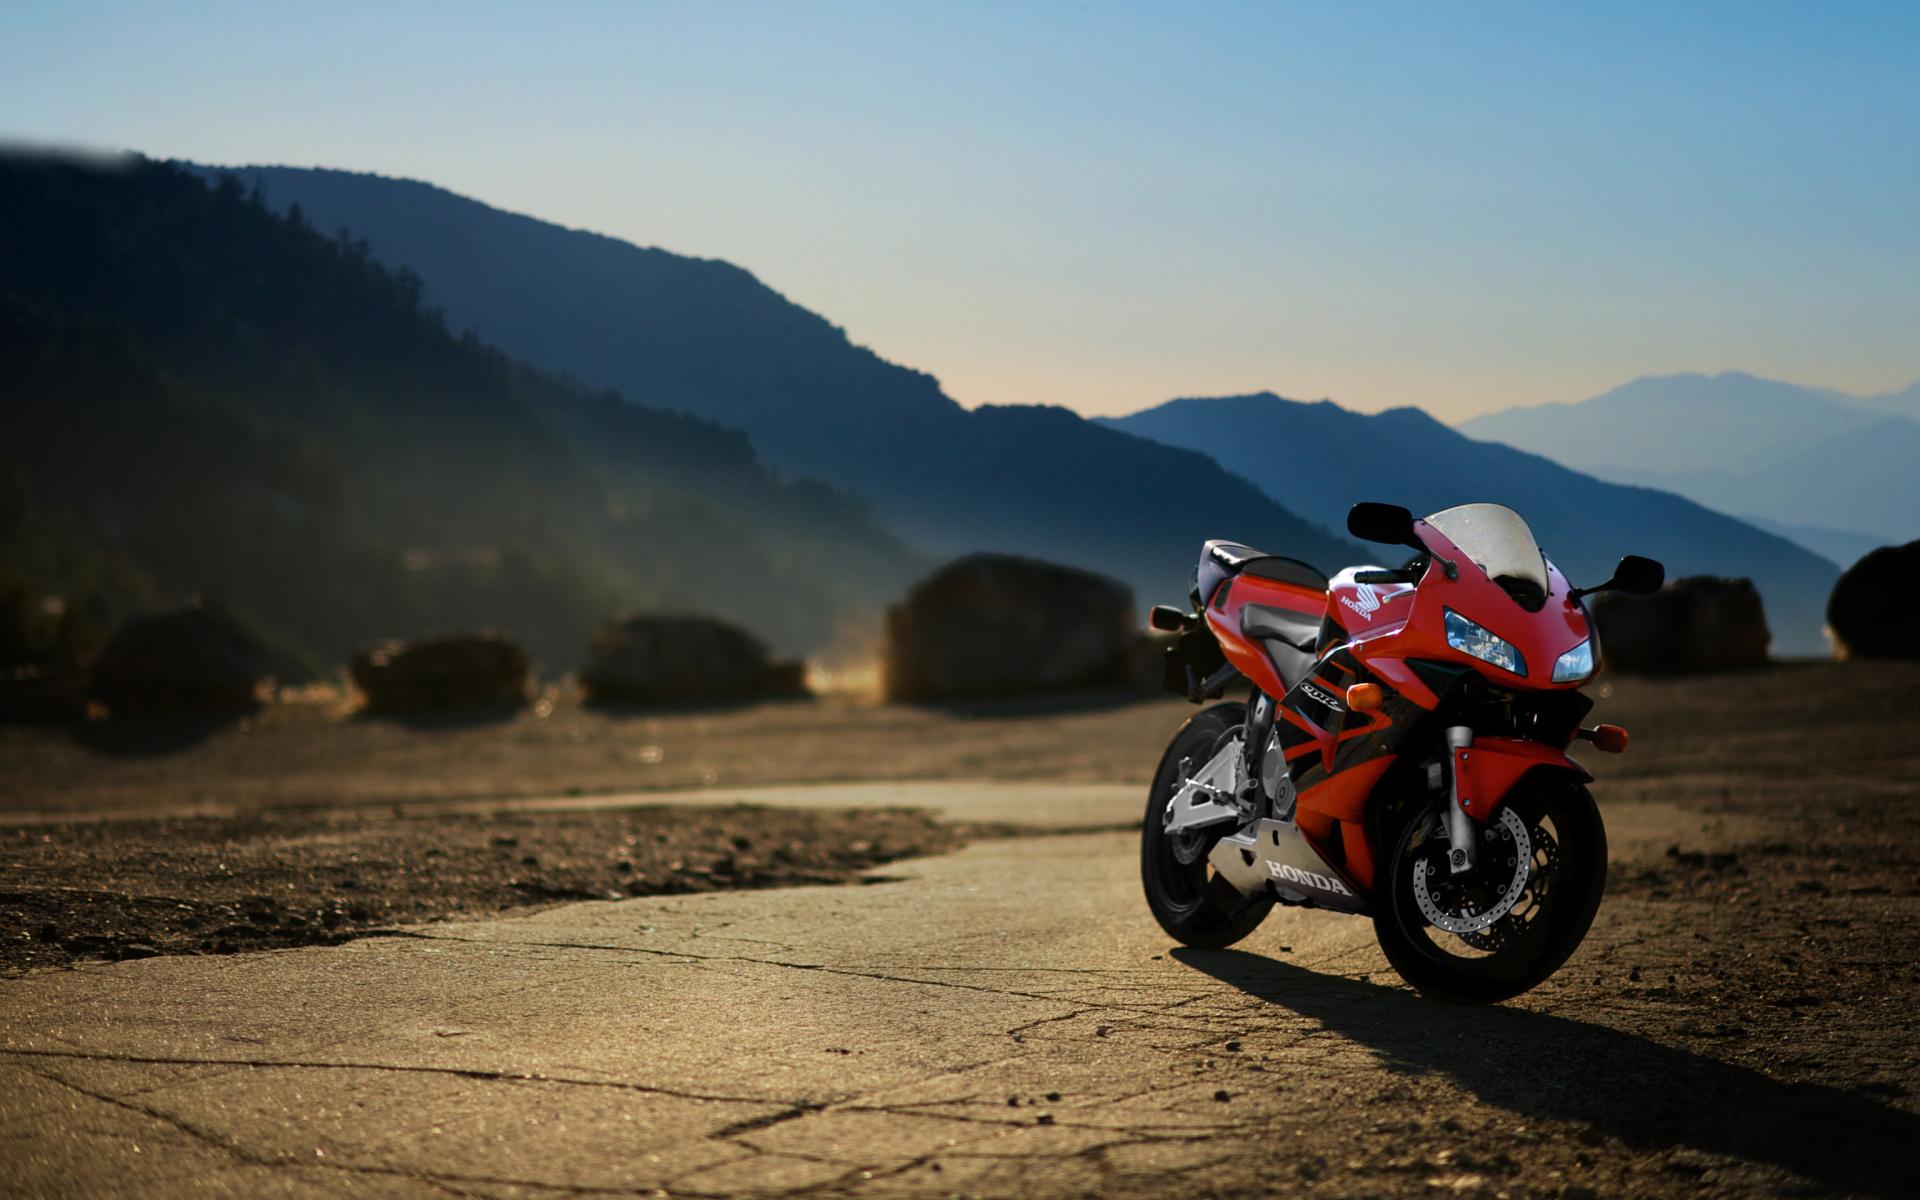 Honda CBR600RR HD Wallpaper | Background Image | 1920x1200 ...Honda Superbike 2013 Wallpaper